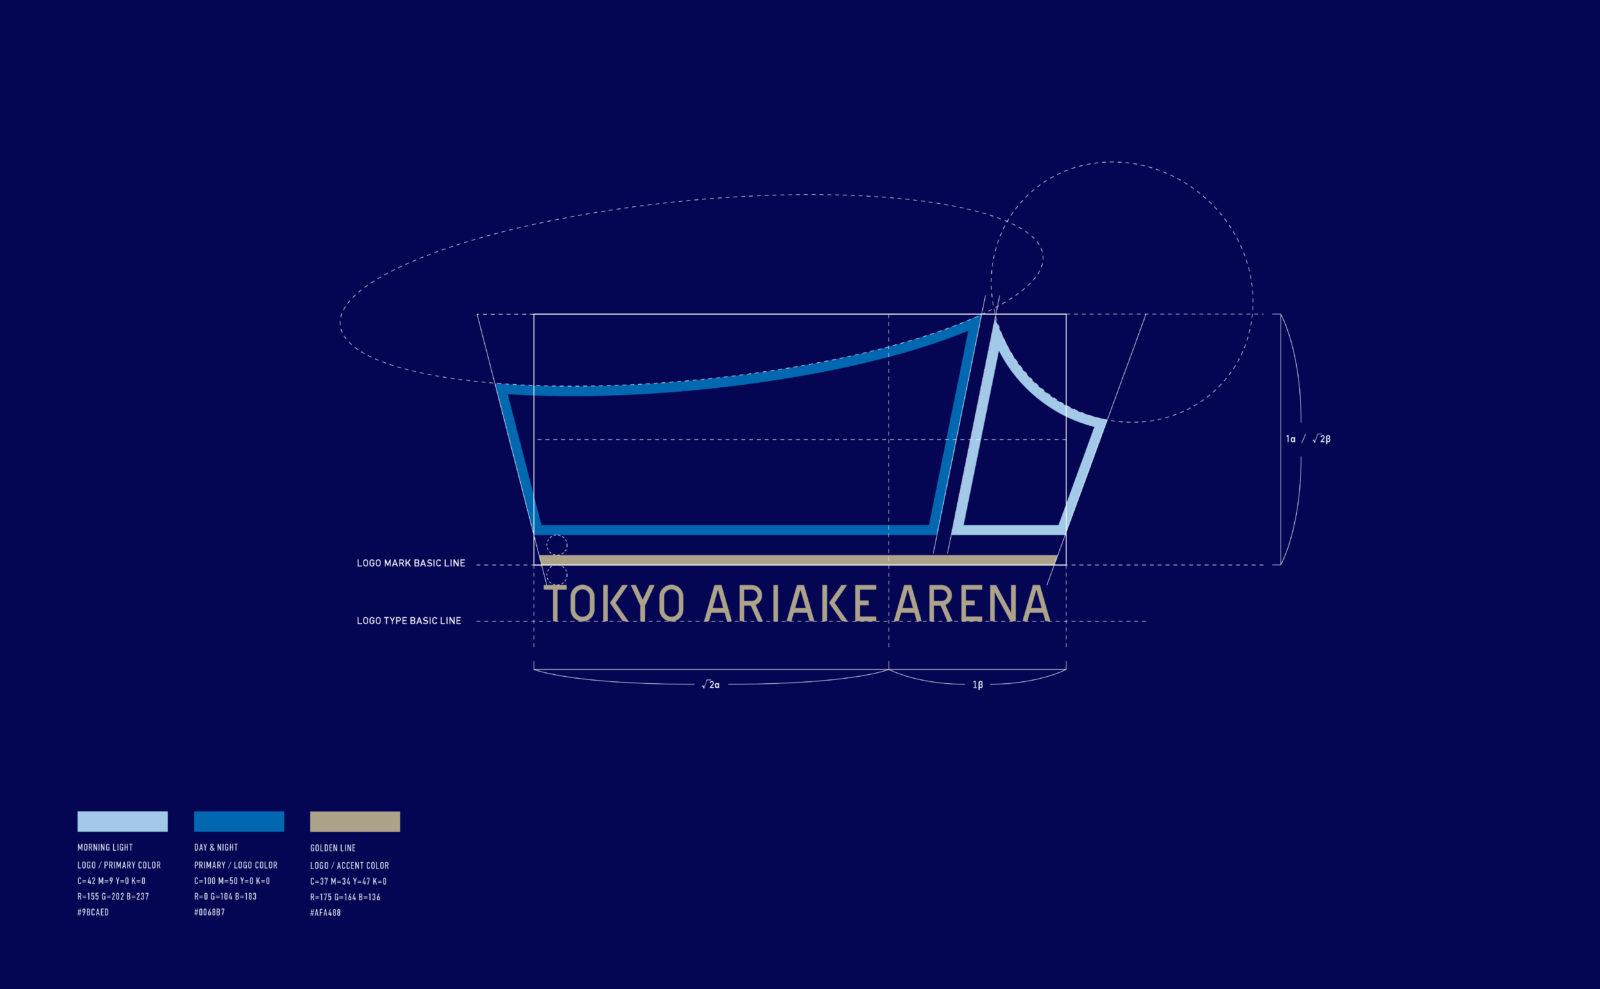 TOKYO ARIAKE ARENA__-3